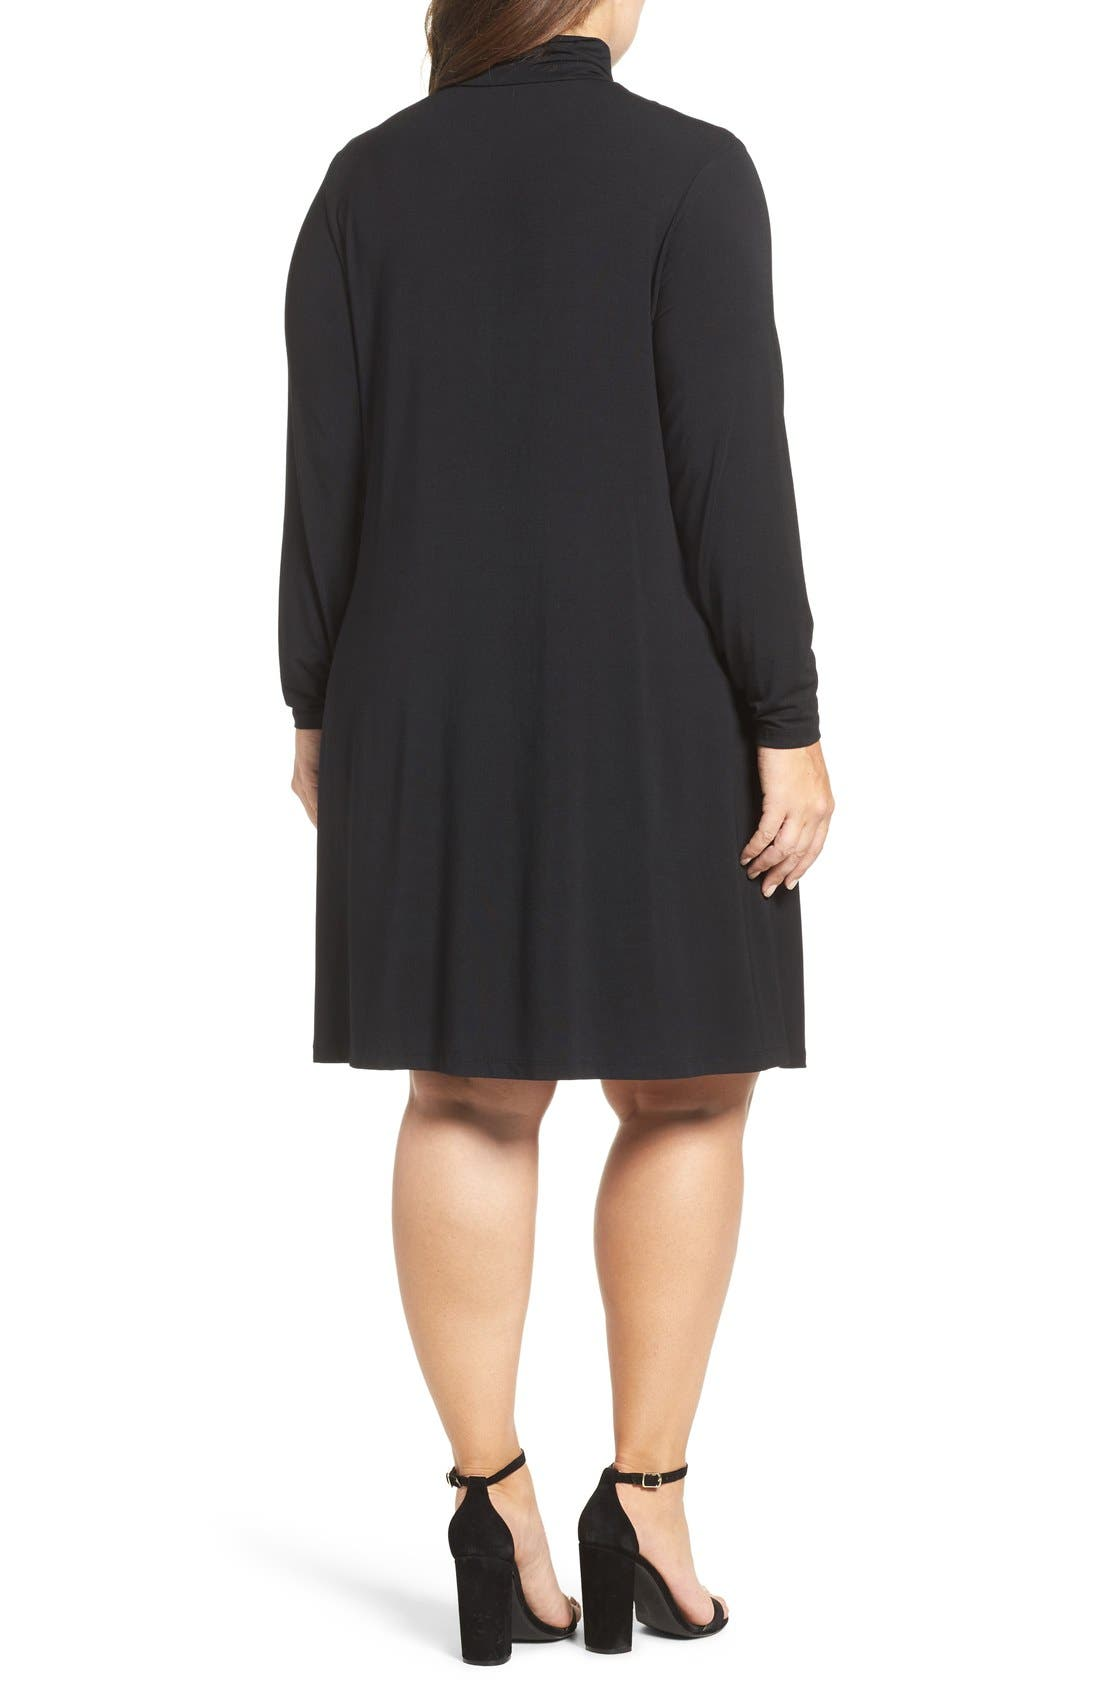 Sally Turtleneck A-Line Dress,                             Alternate thumbnail 2, color,                             Black